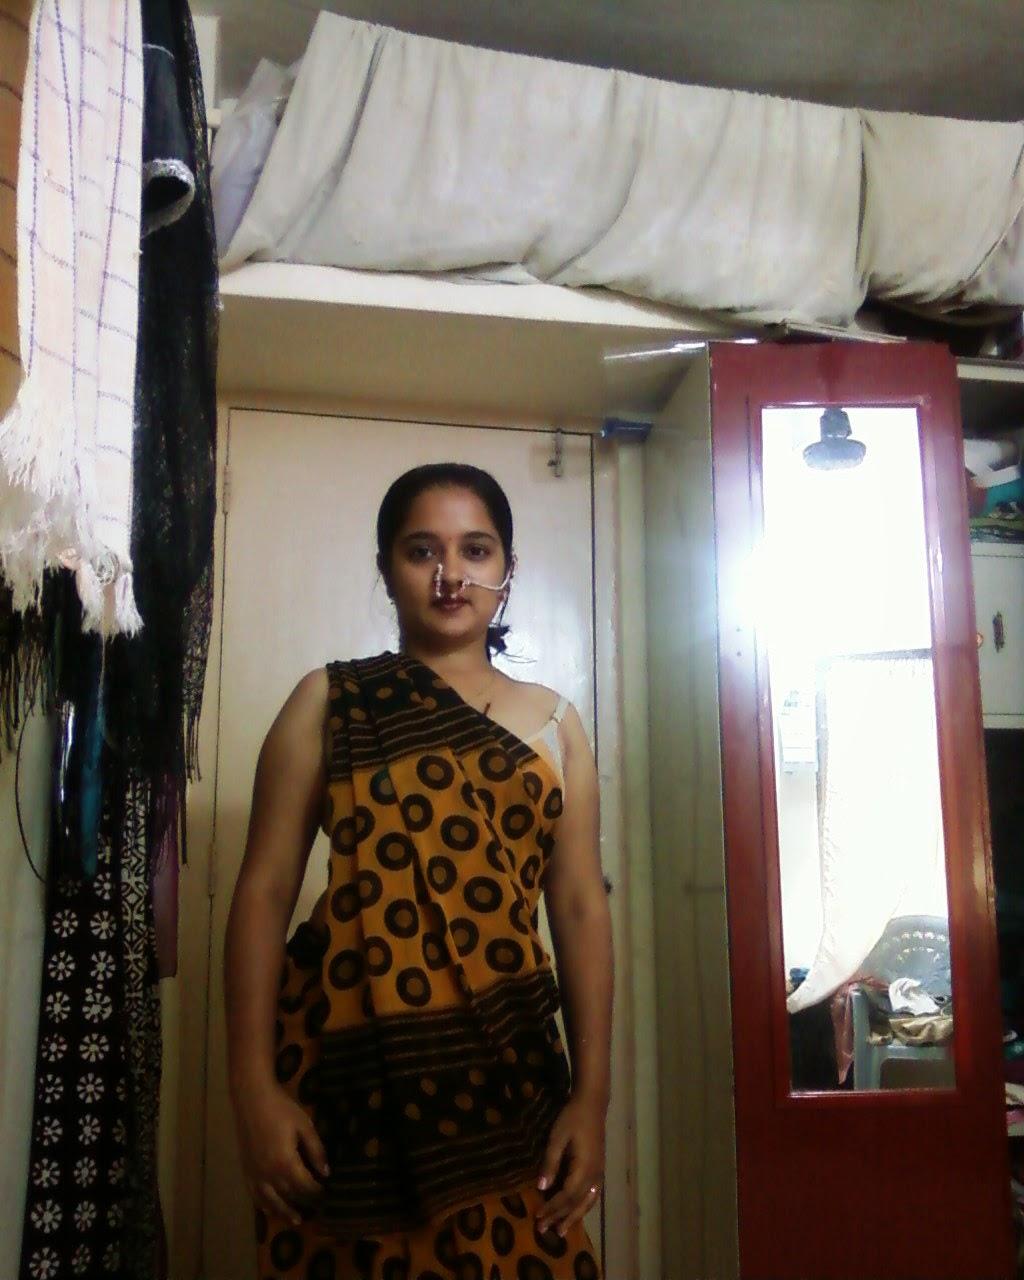 Super Figures Online Mangala Bhabhi Photos-8291